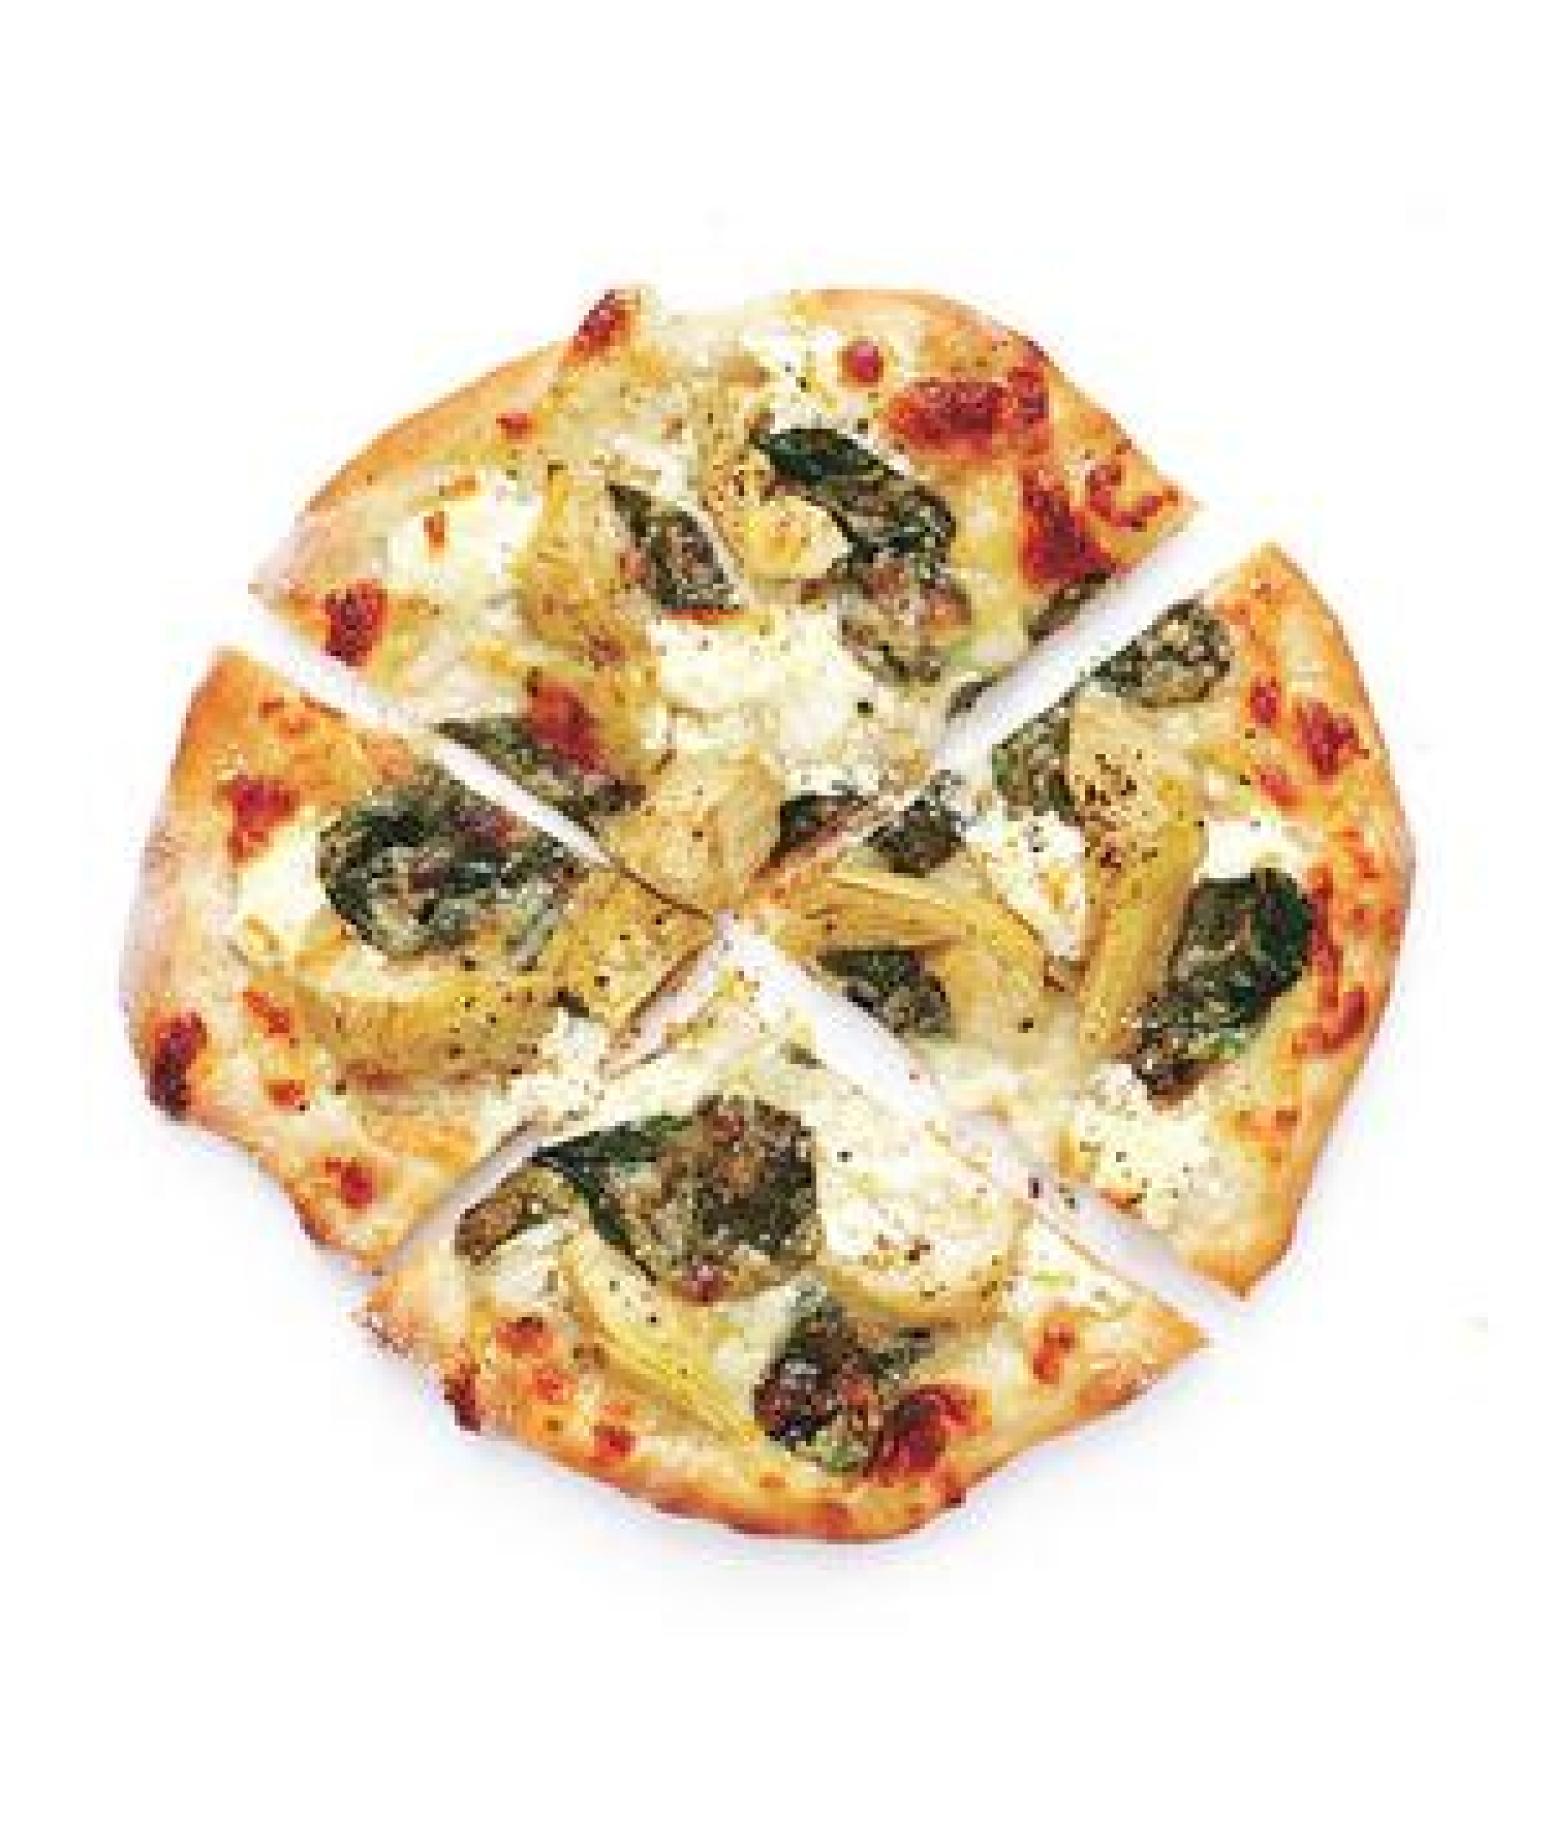 Spinach and Artichoke Pizzas Recipe | Just A Pinch Recipes